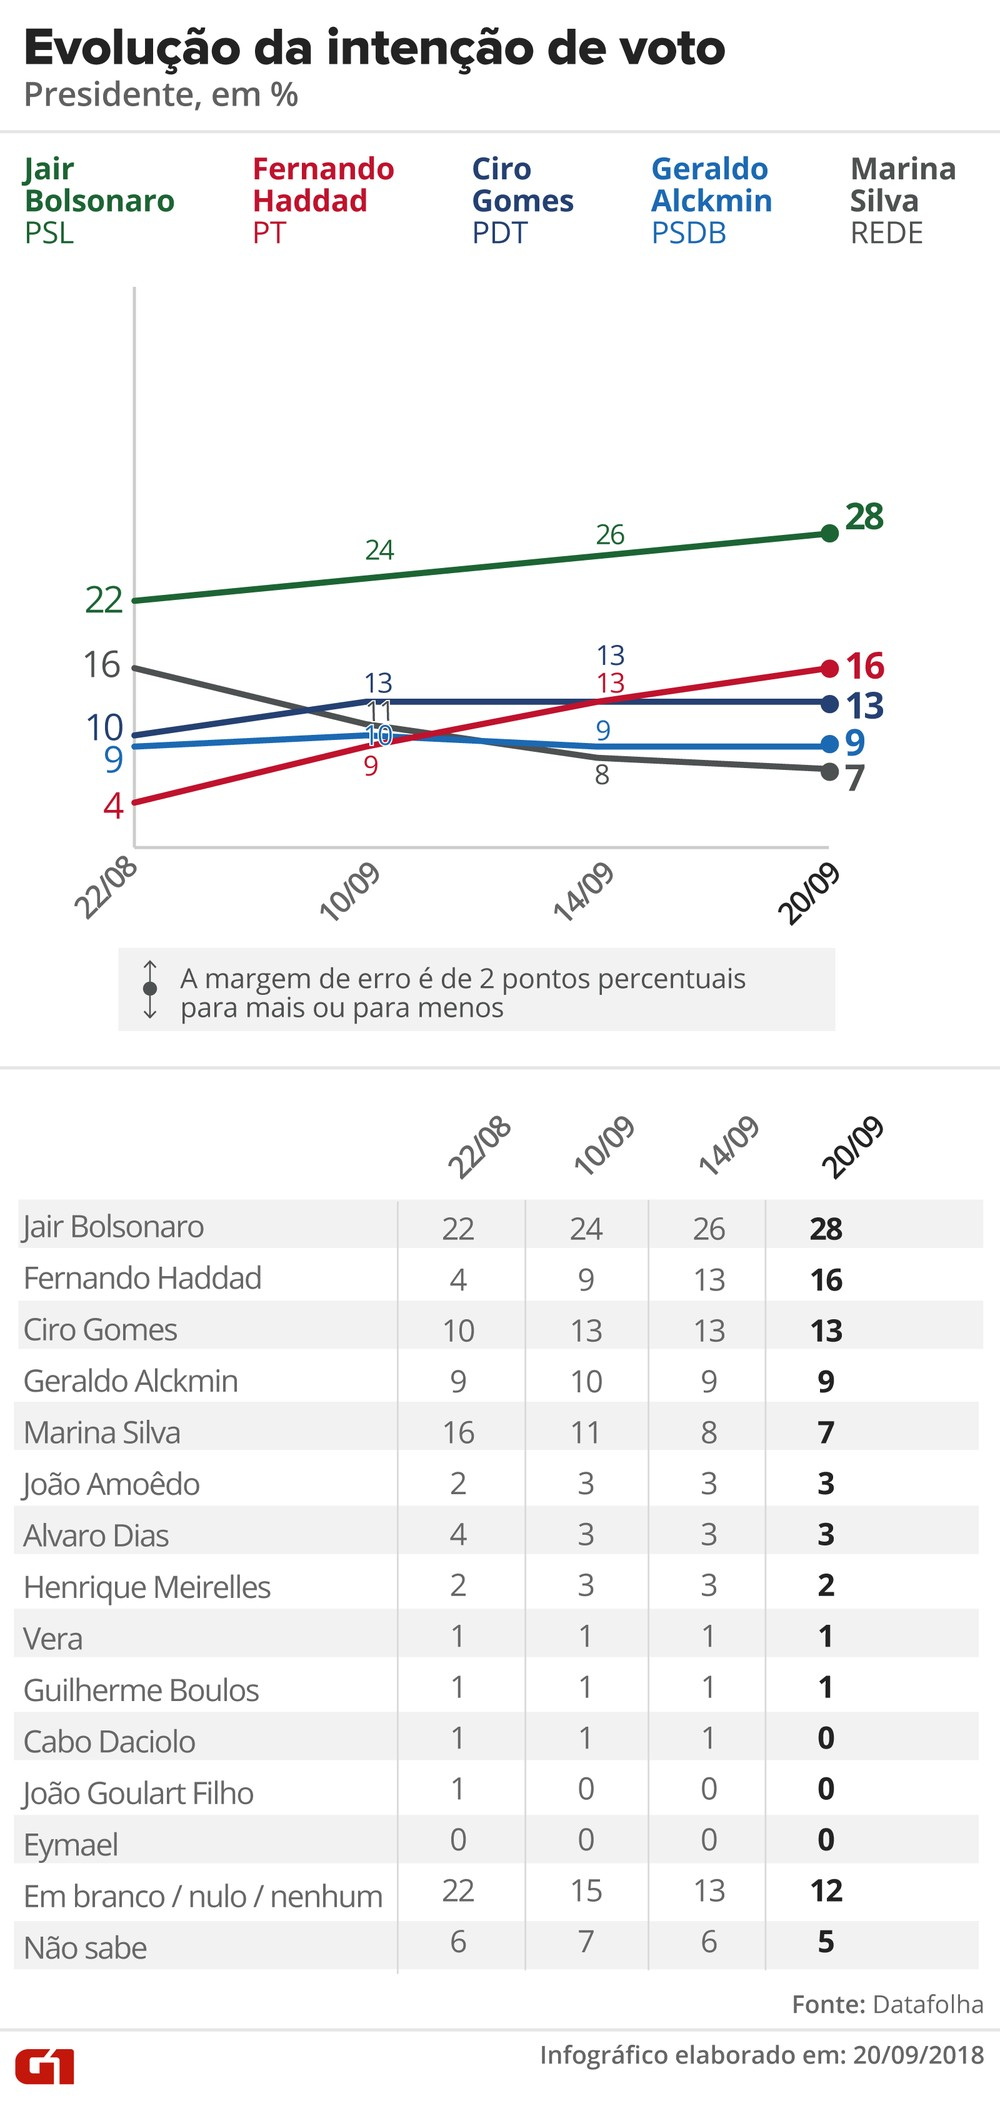 datafolha 2009 intencao voto